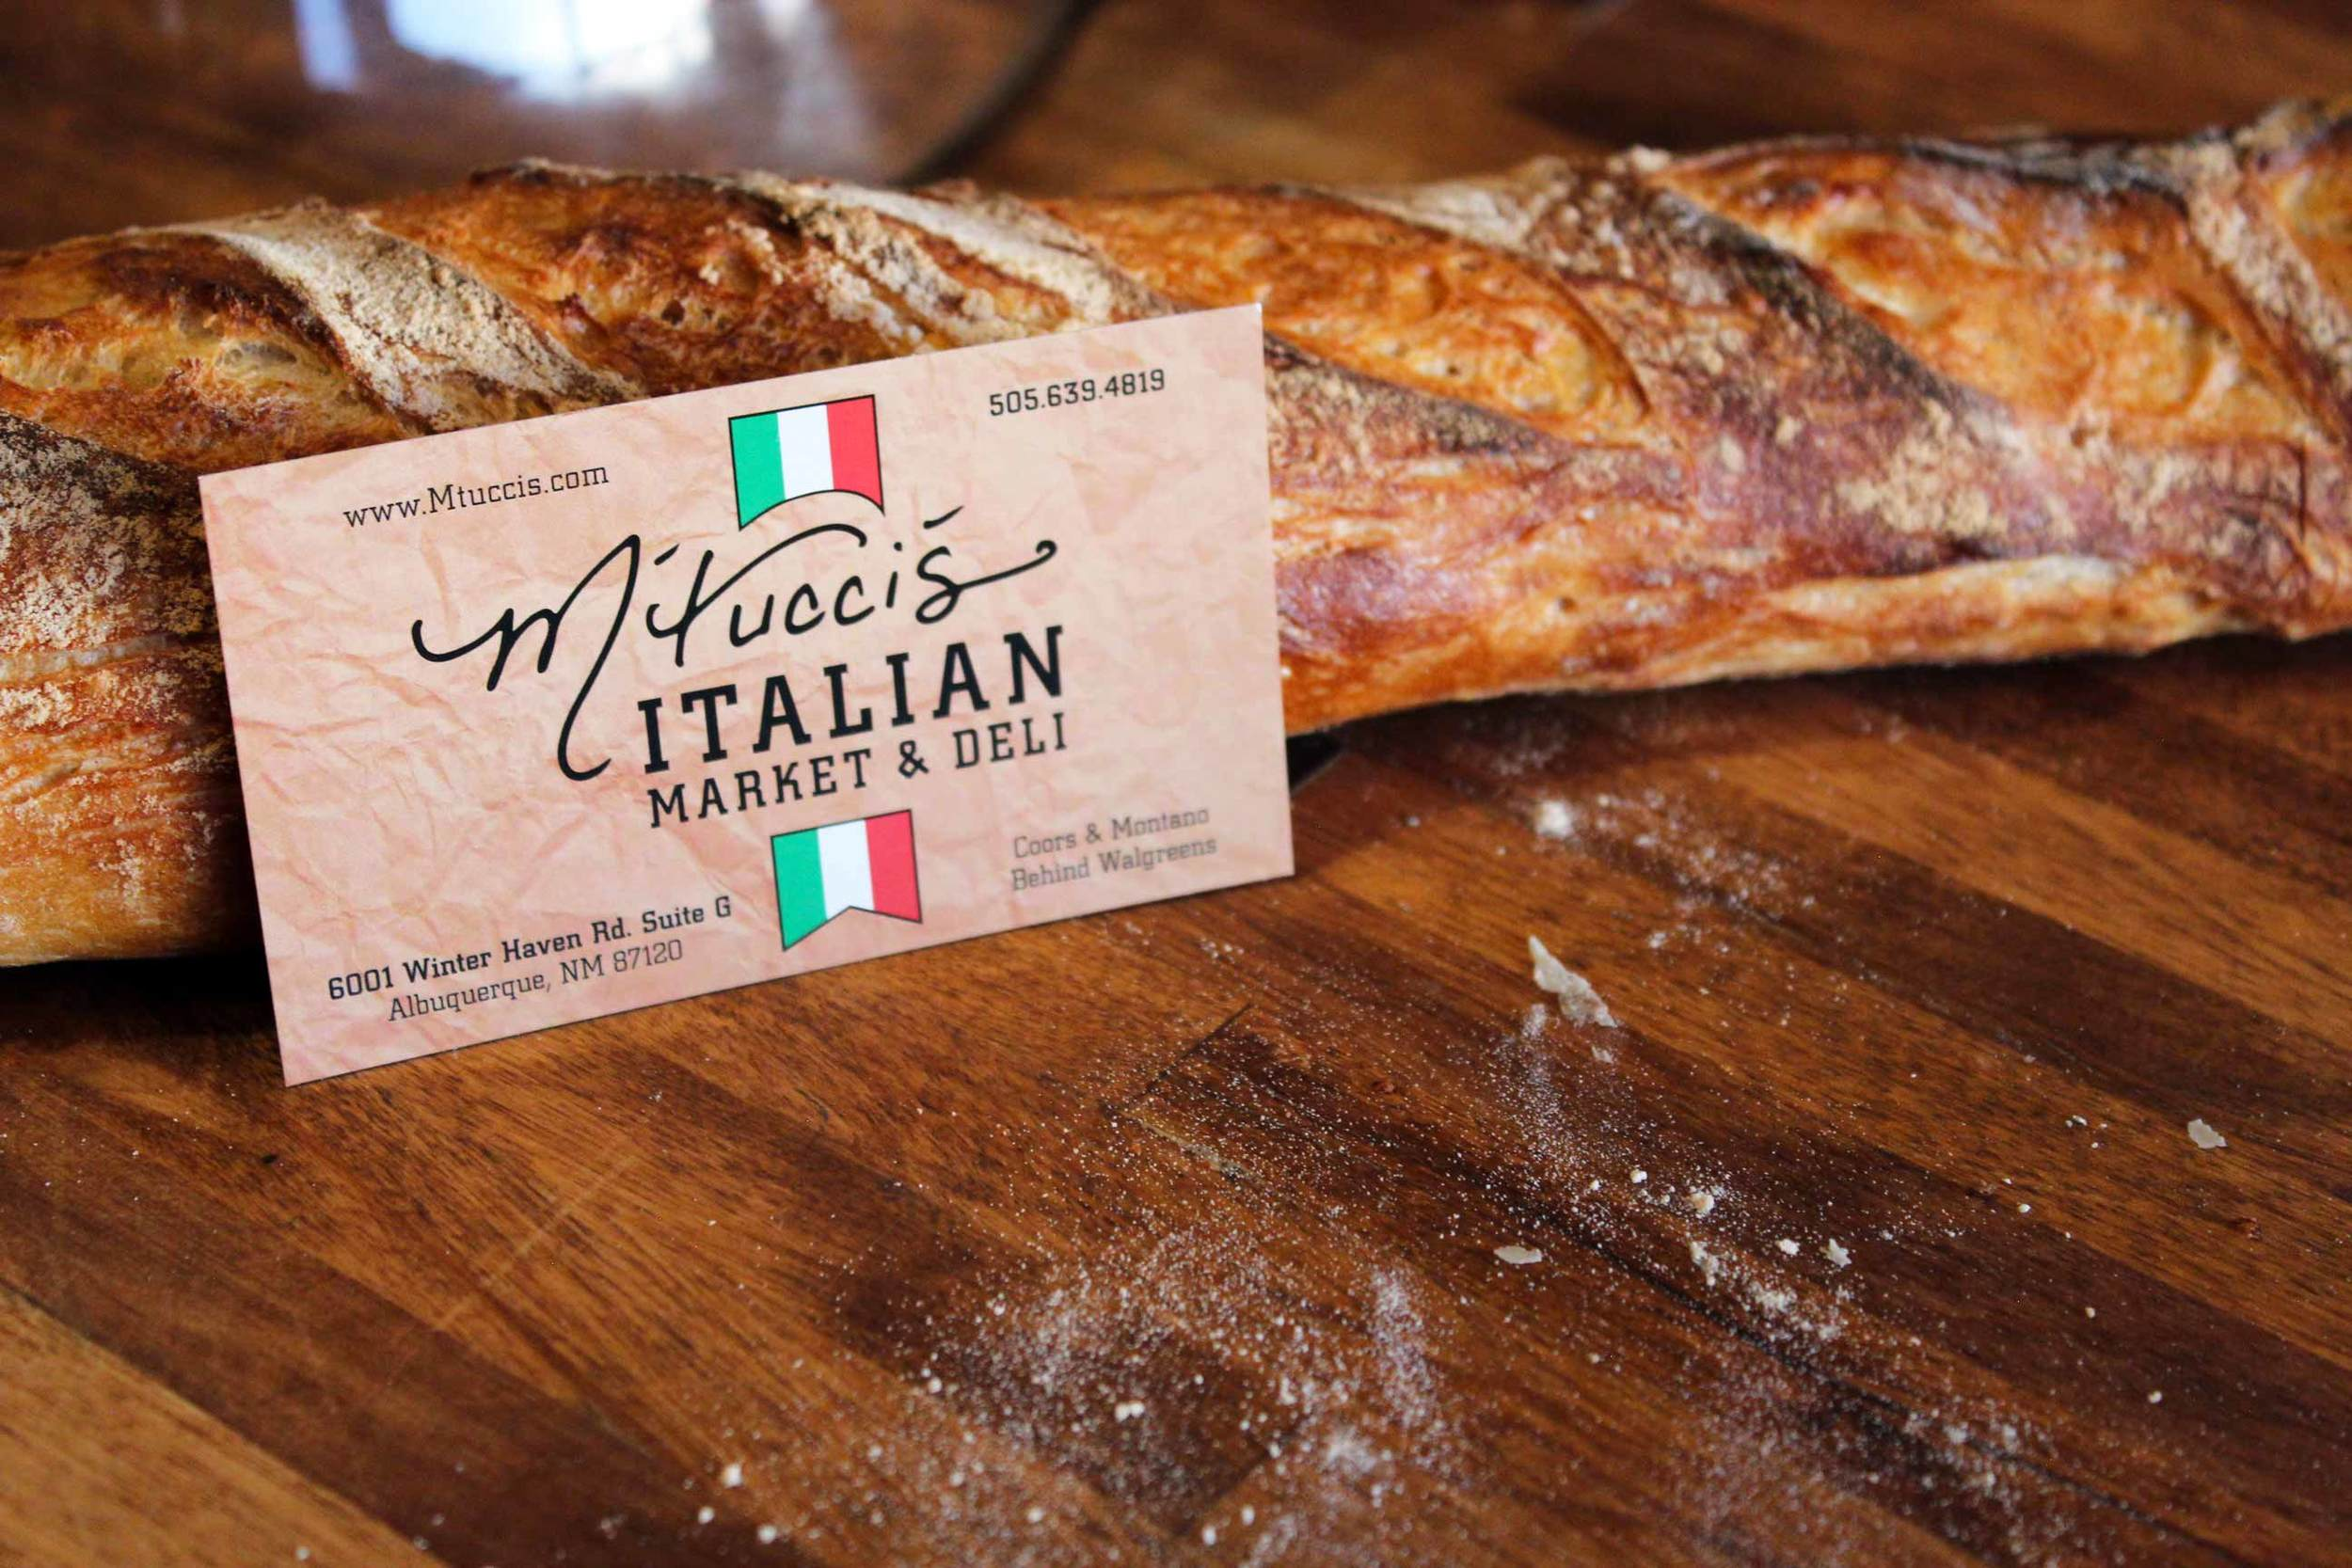 IMG_5886_Mtuccis_Italian_Market_and_Deli.jpg